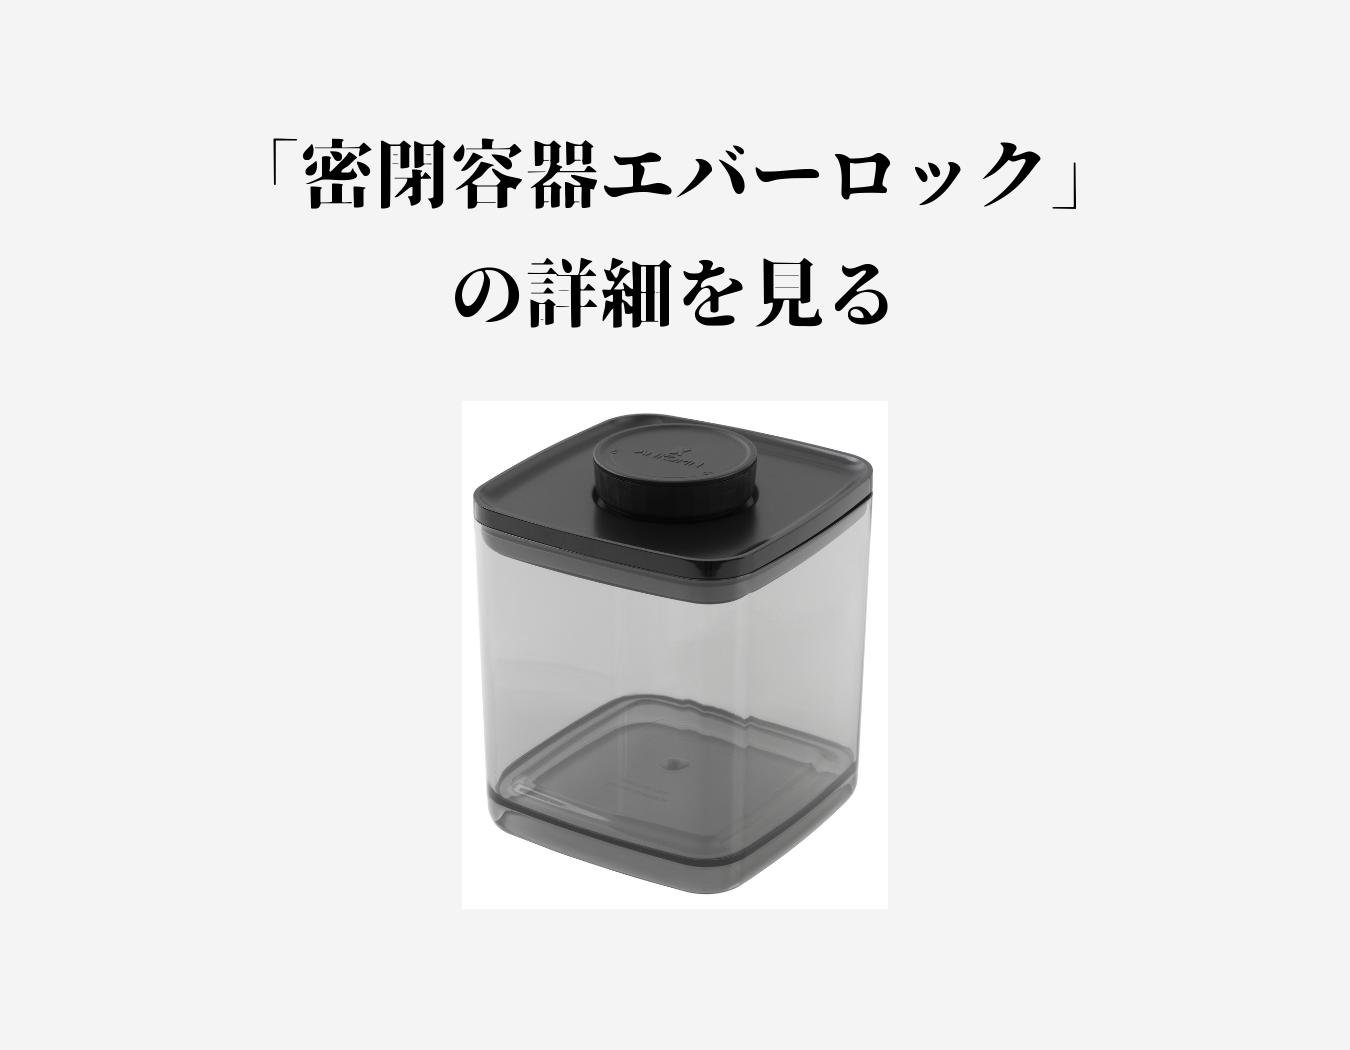 ANKOMN(アンコムン)_密閉容器エバーロックの詳細を見る